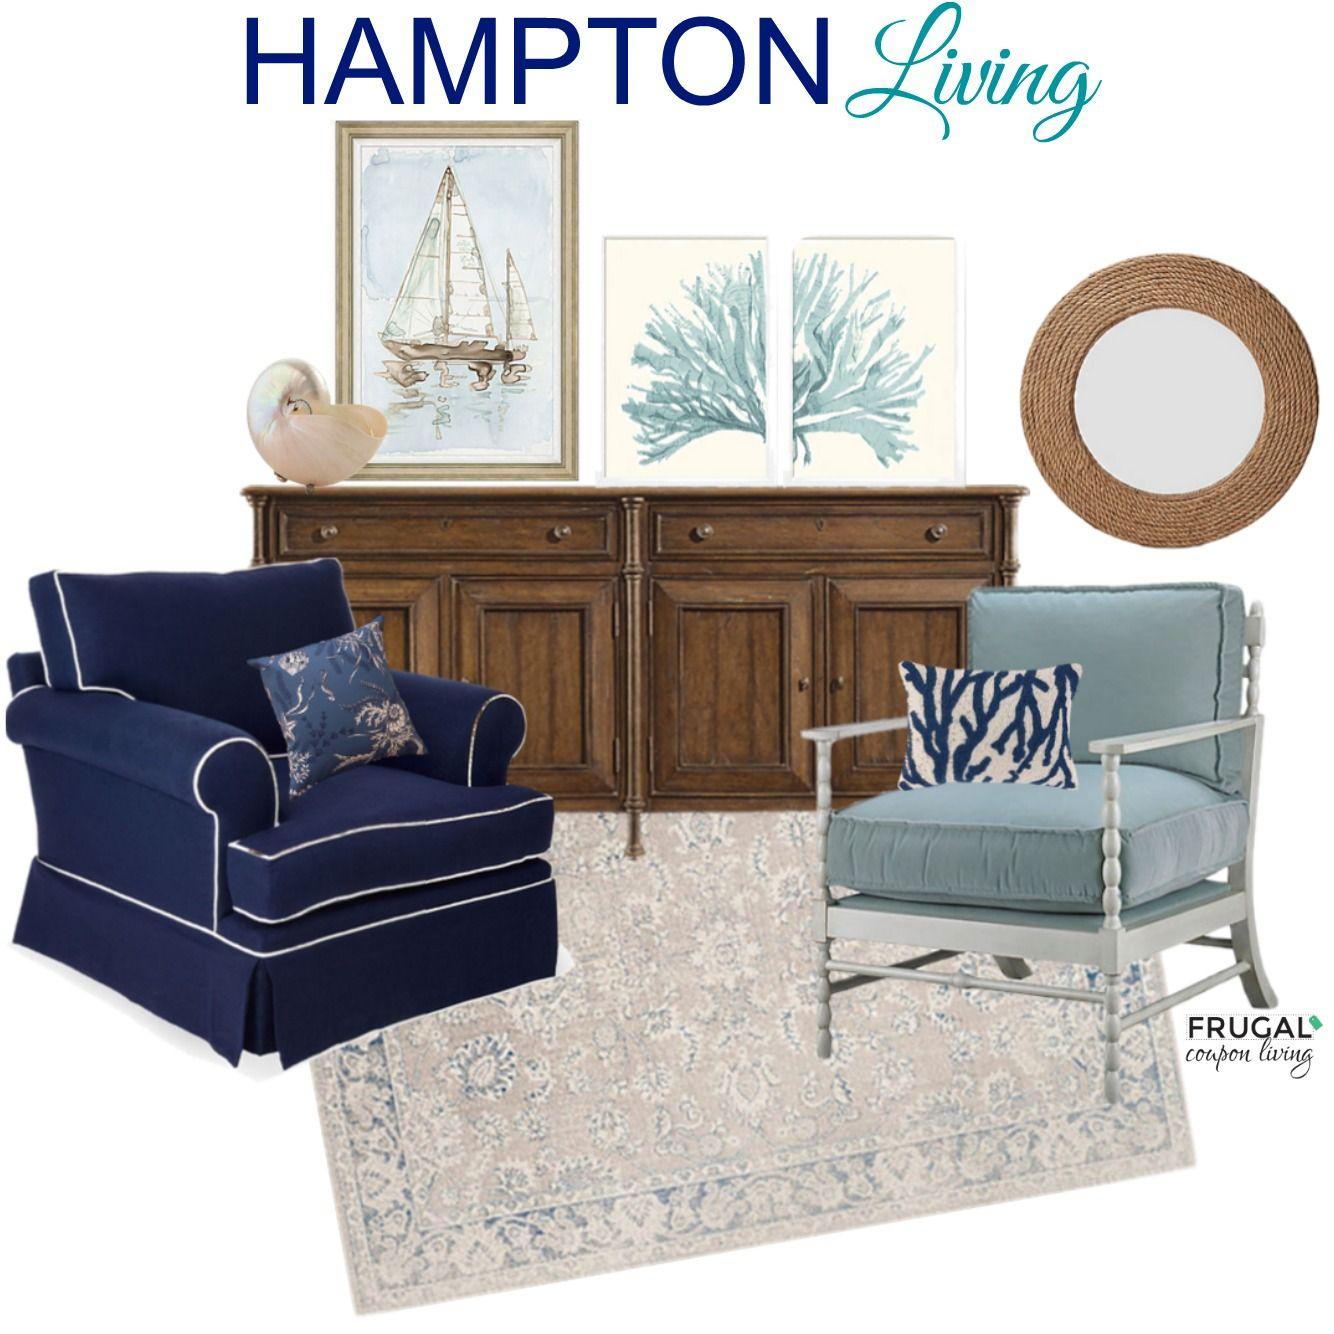 Designer Hampton Living From One Kings Lane Frugal